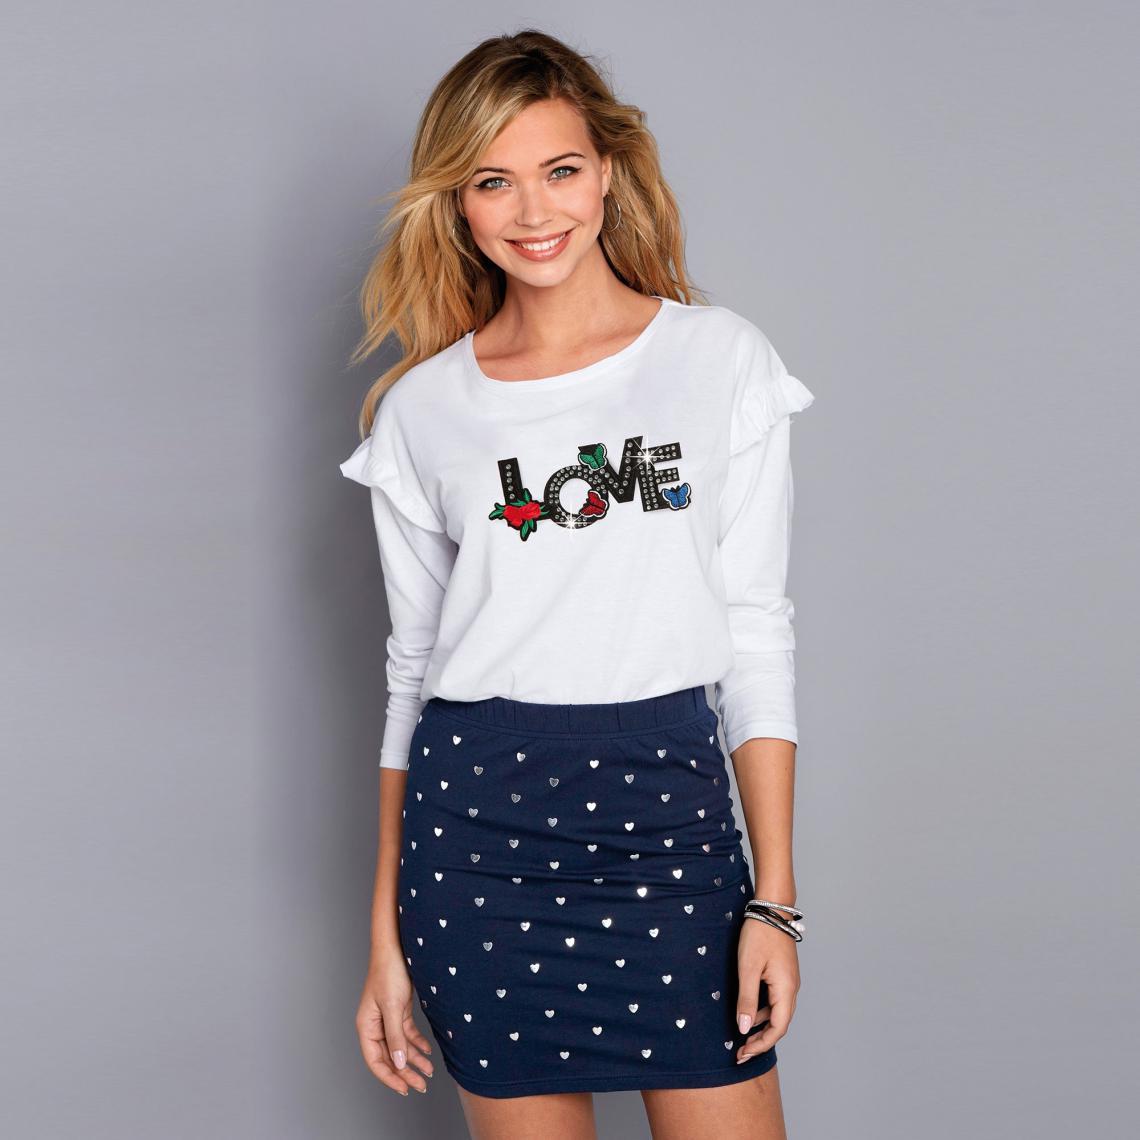 acb95c64c558e Tee-shirt manches longues volants lettres et strass fantaisie femme - Blanc